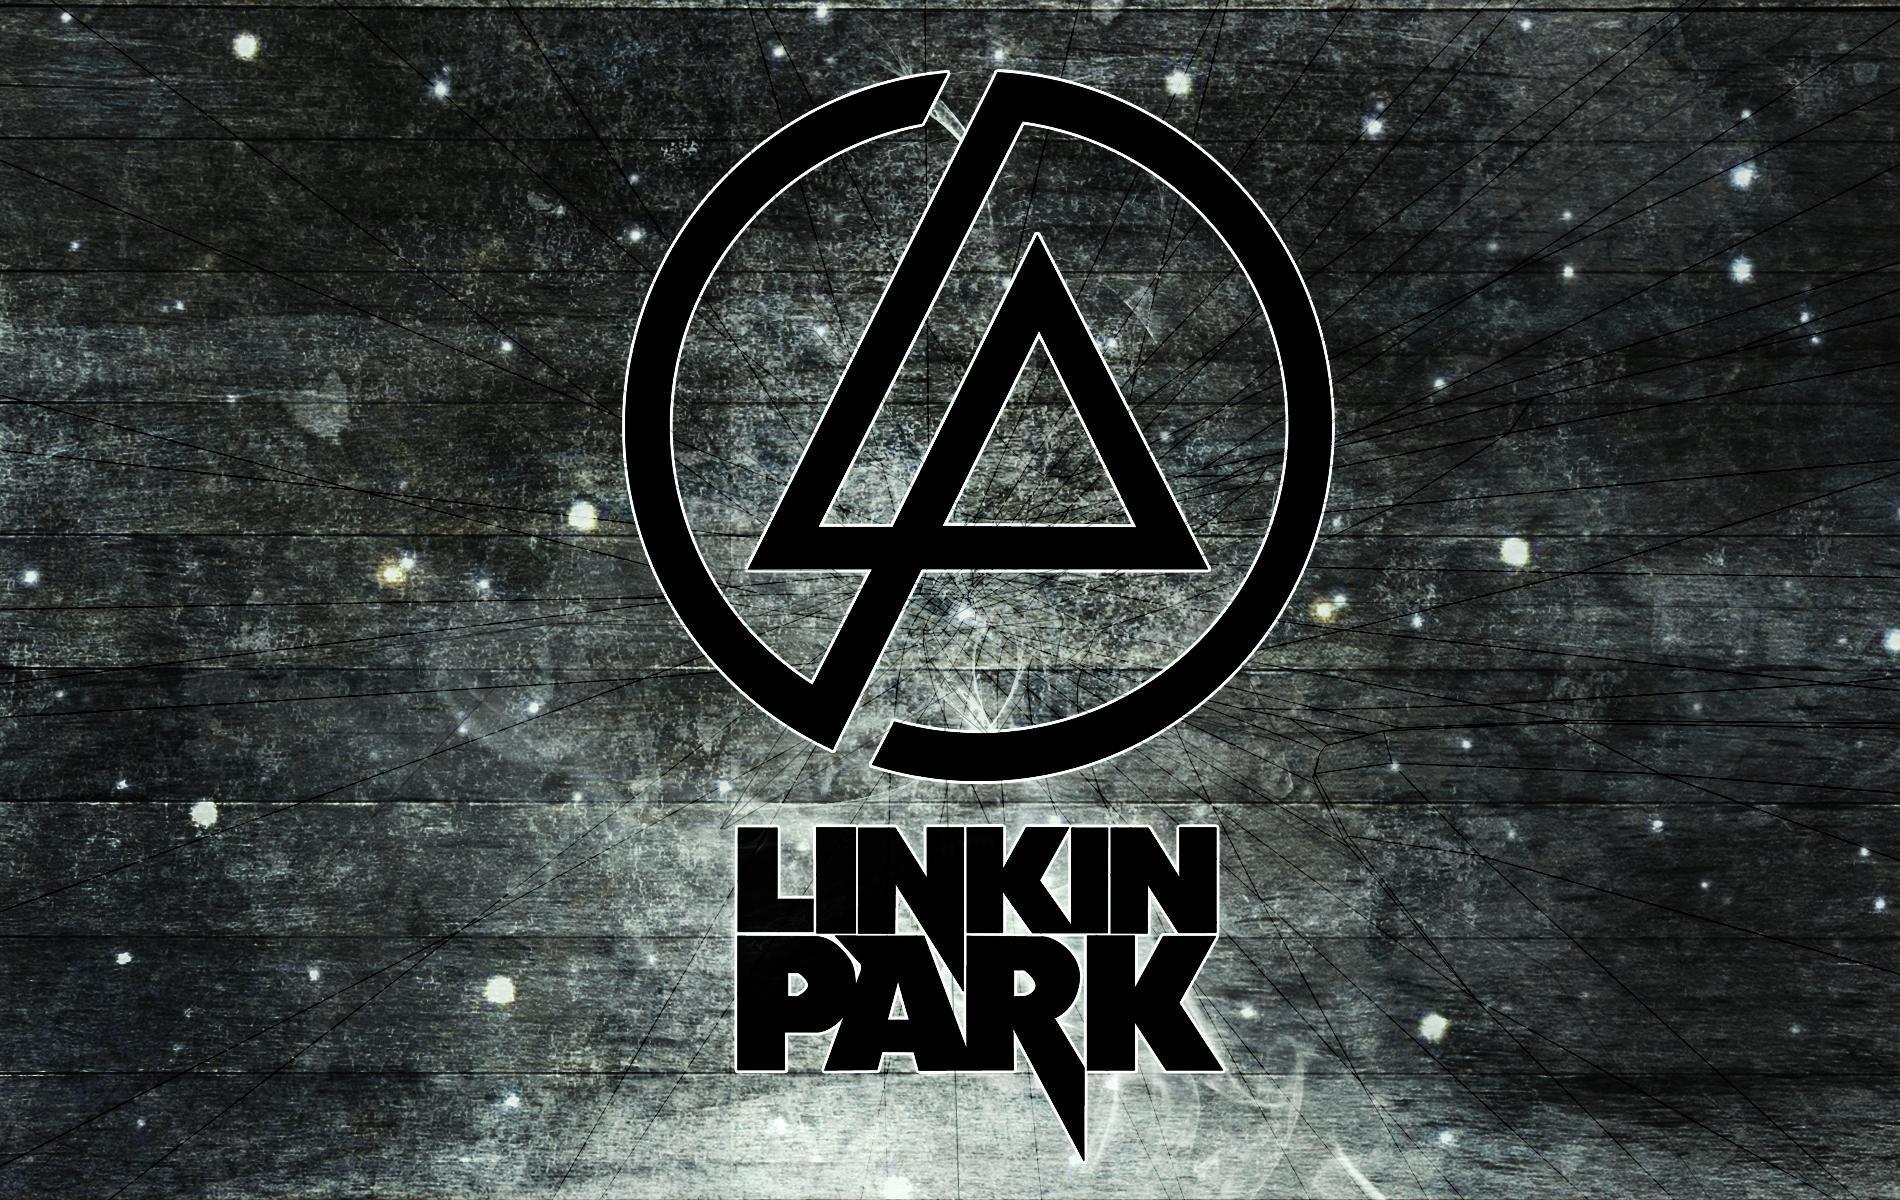 Linkin Park Wallpapers Hd Wallpaper Cave